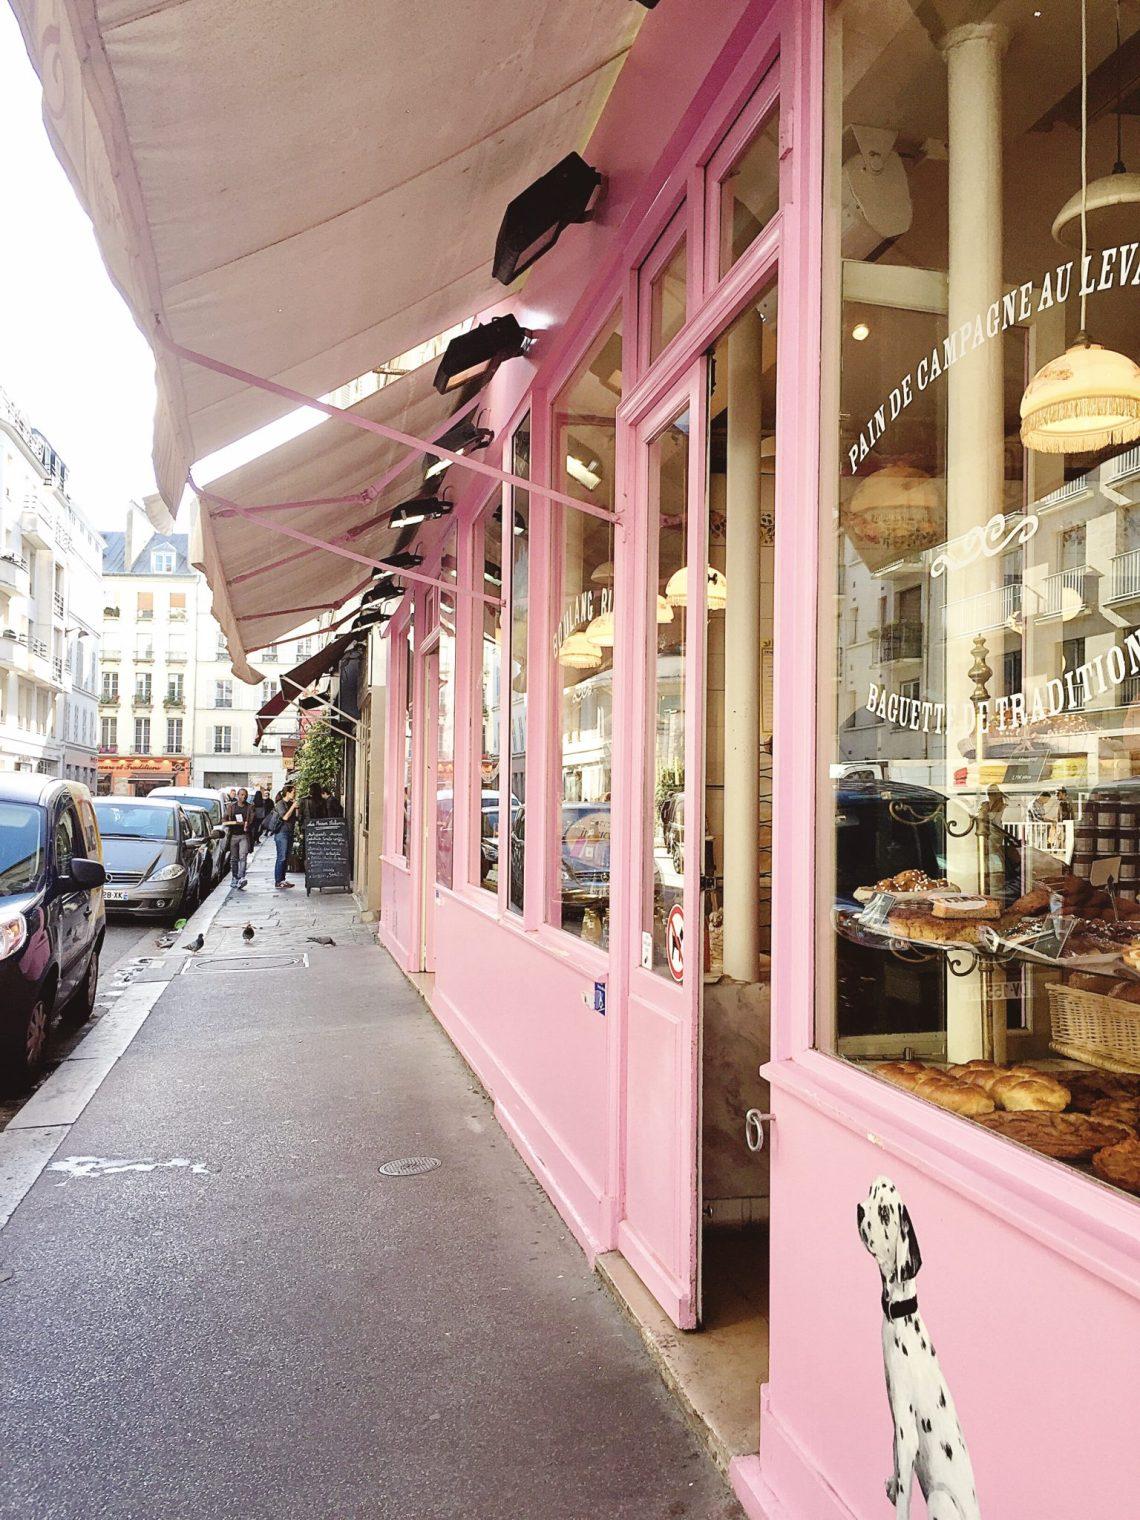 St. Germaine Paris neighborhood